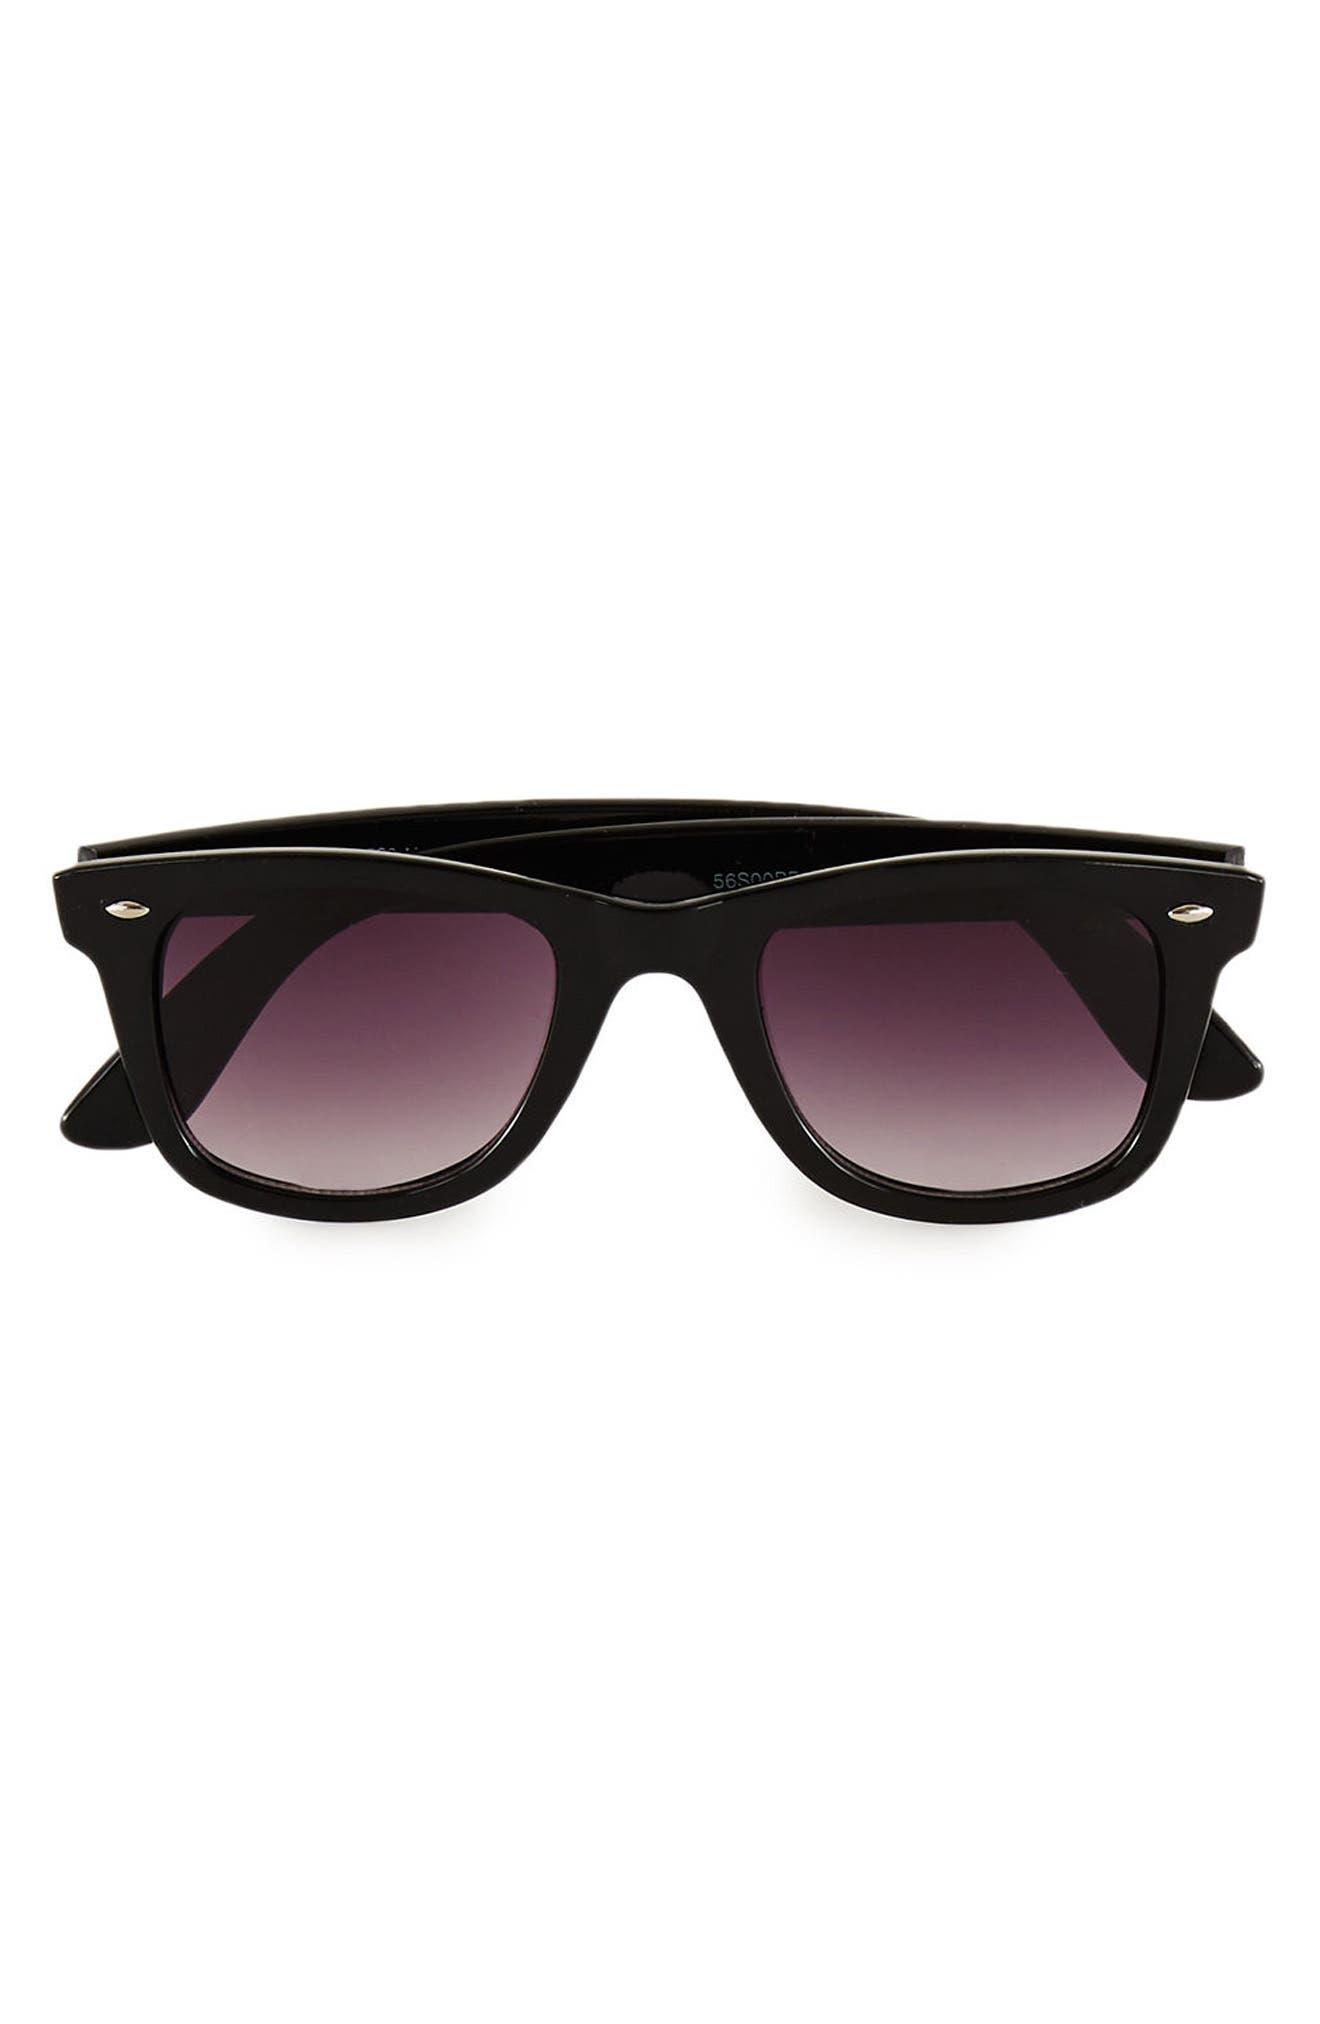 48mm Round Sunglasses,                         Main,                         color, Black